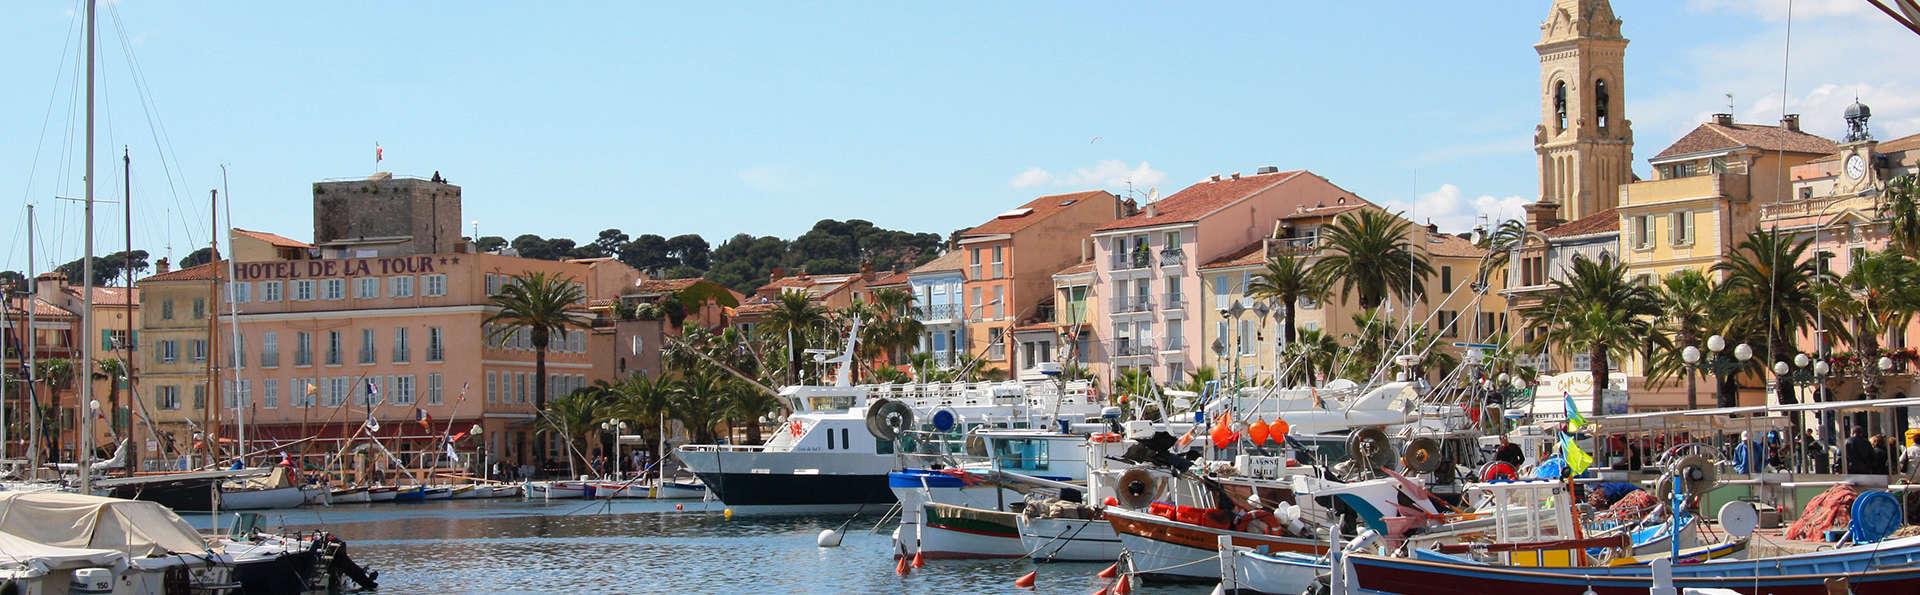 Adonis Sanary Grand Hotel des Bains - EDIT_Sanary-sur-Mer__port2.jpg